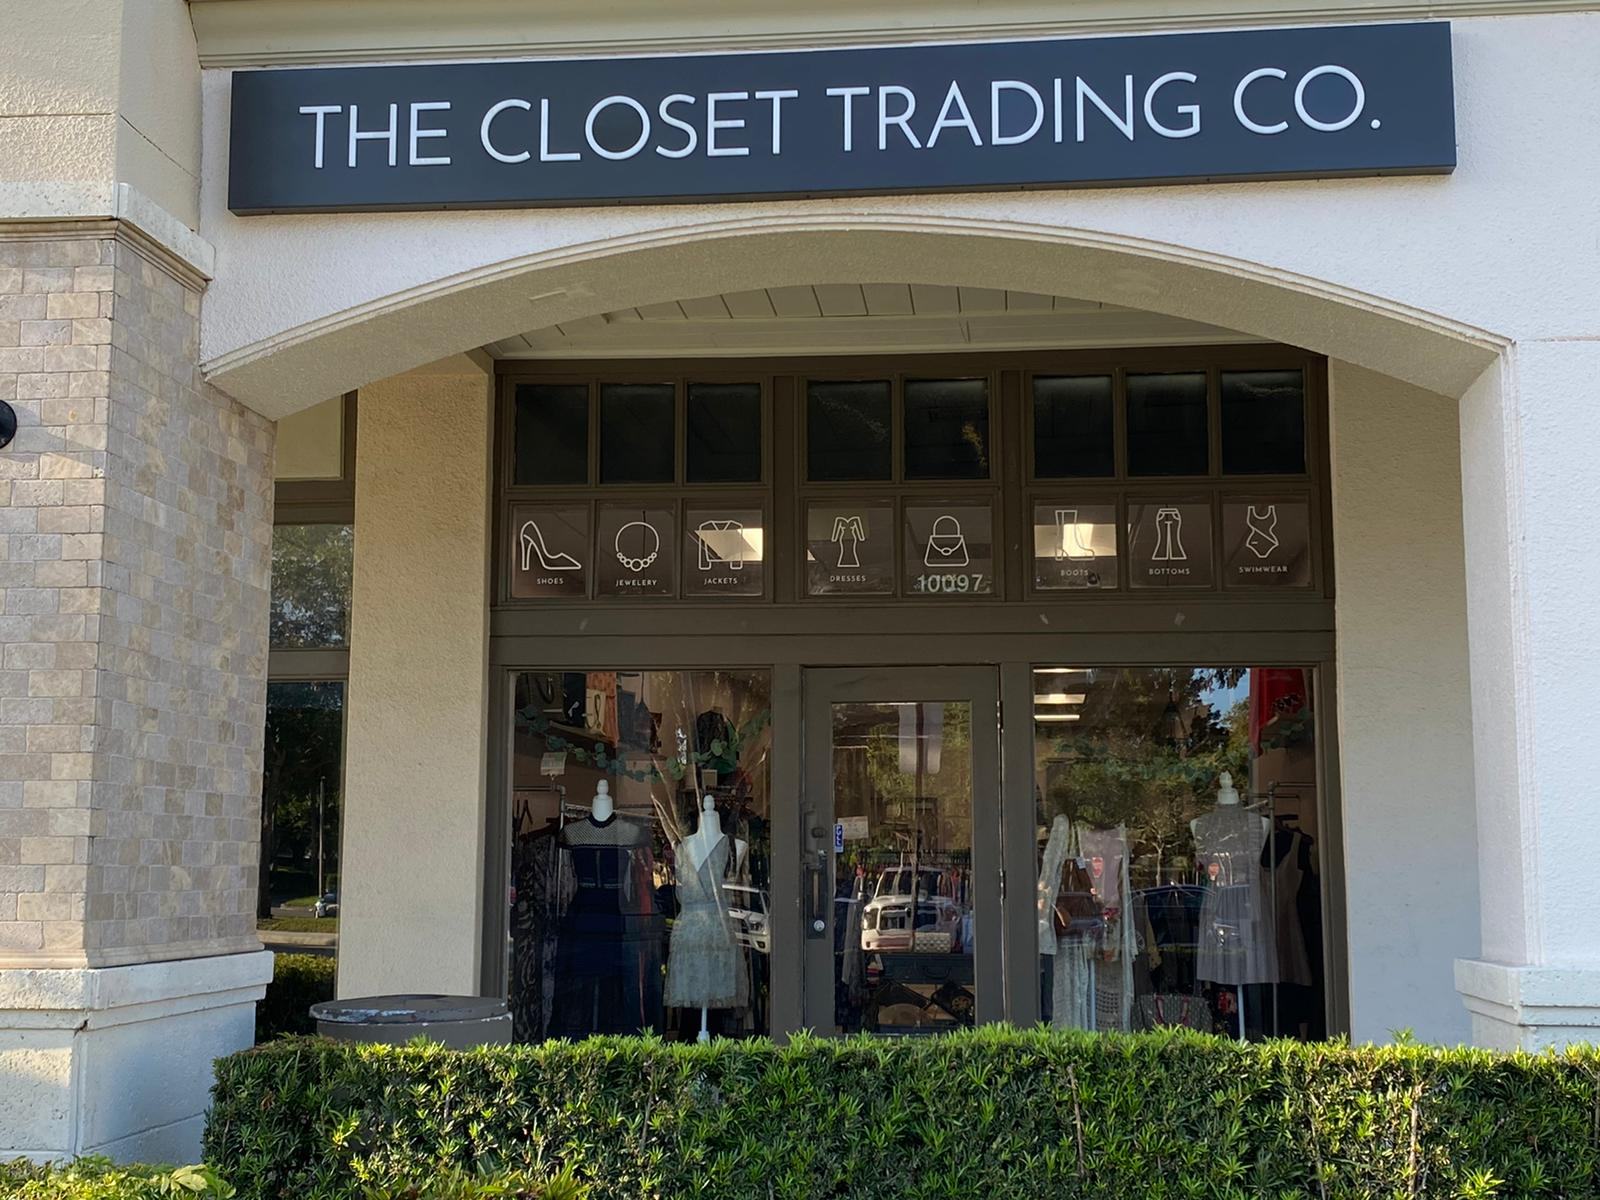 TCTC Franchise Storefront in Plantation, Florida